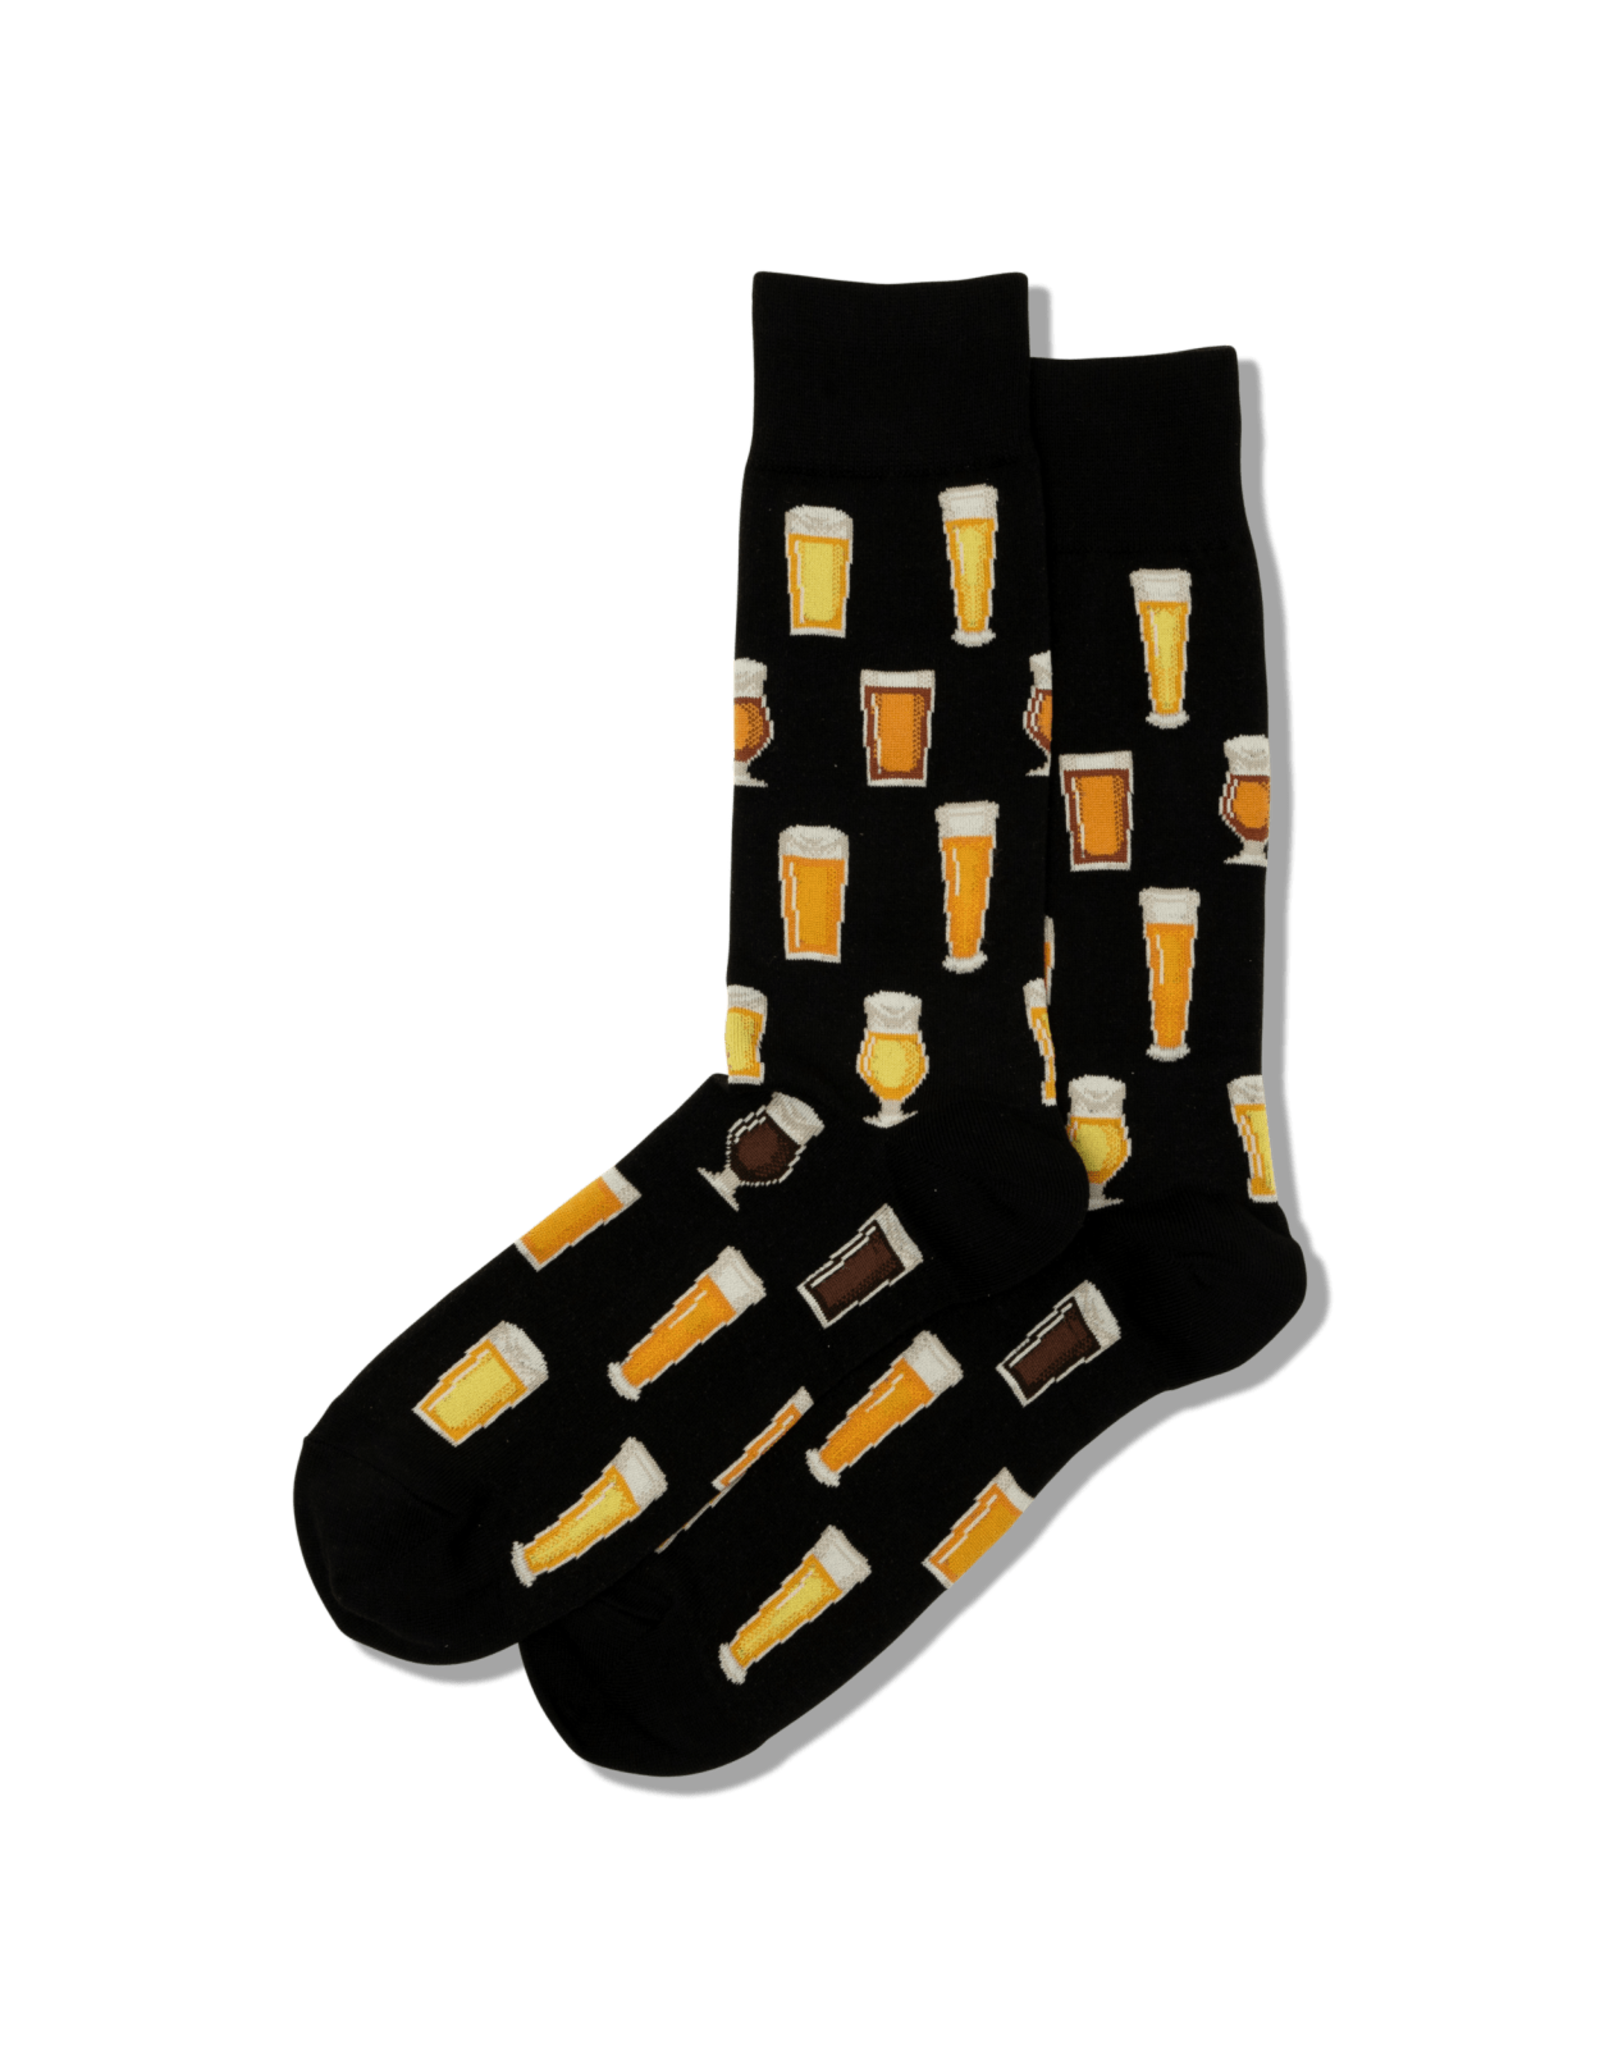 - Men's Beer Socks